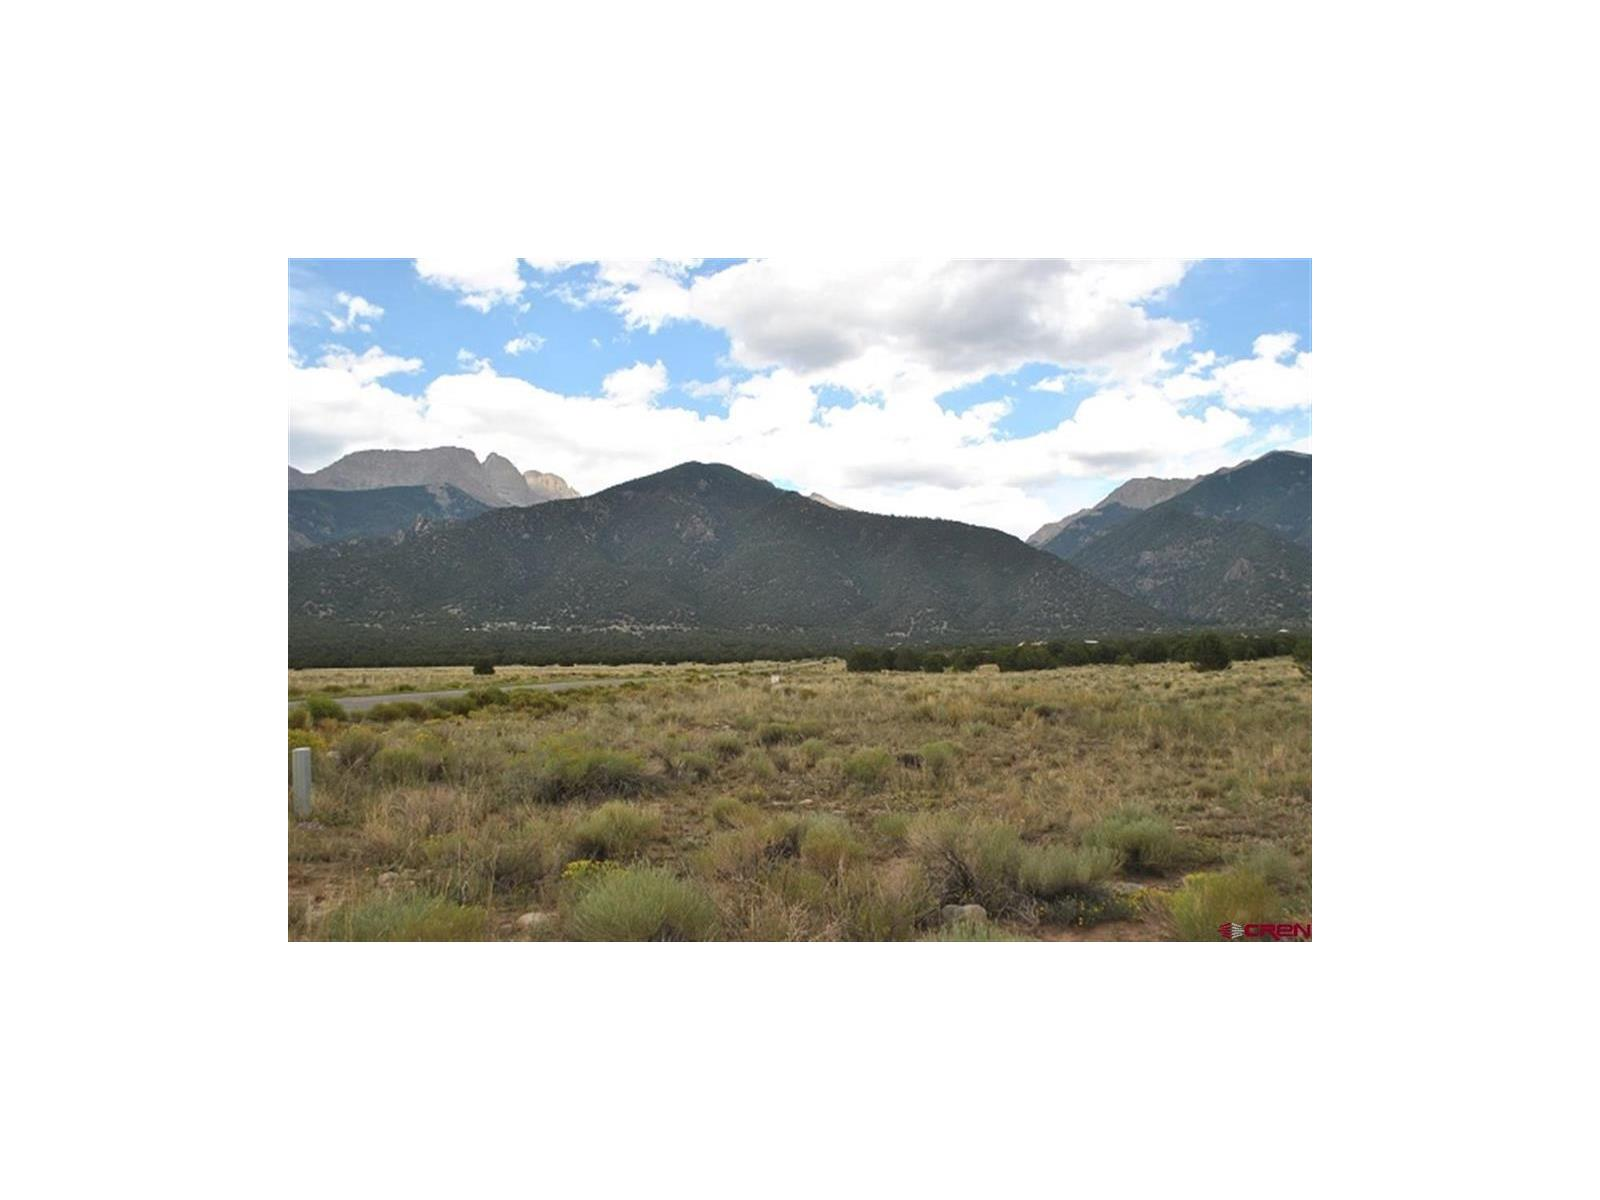 3359 Carefree Way, Crestone, CO 81131 - Crestone, CO real estate listing